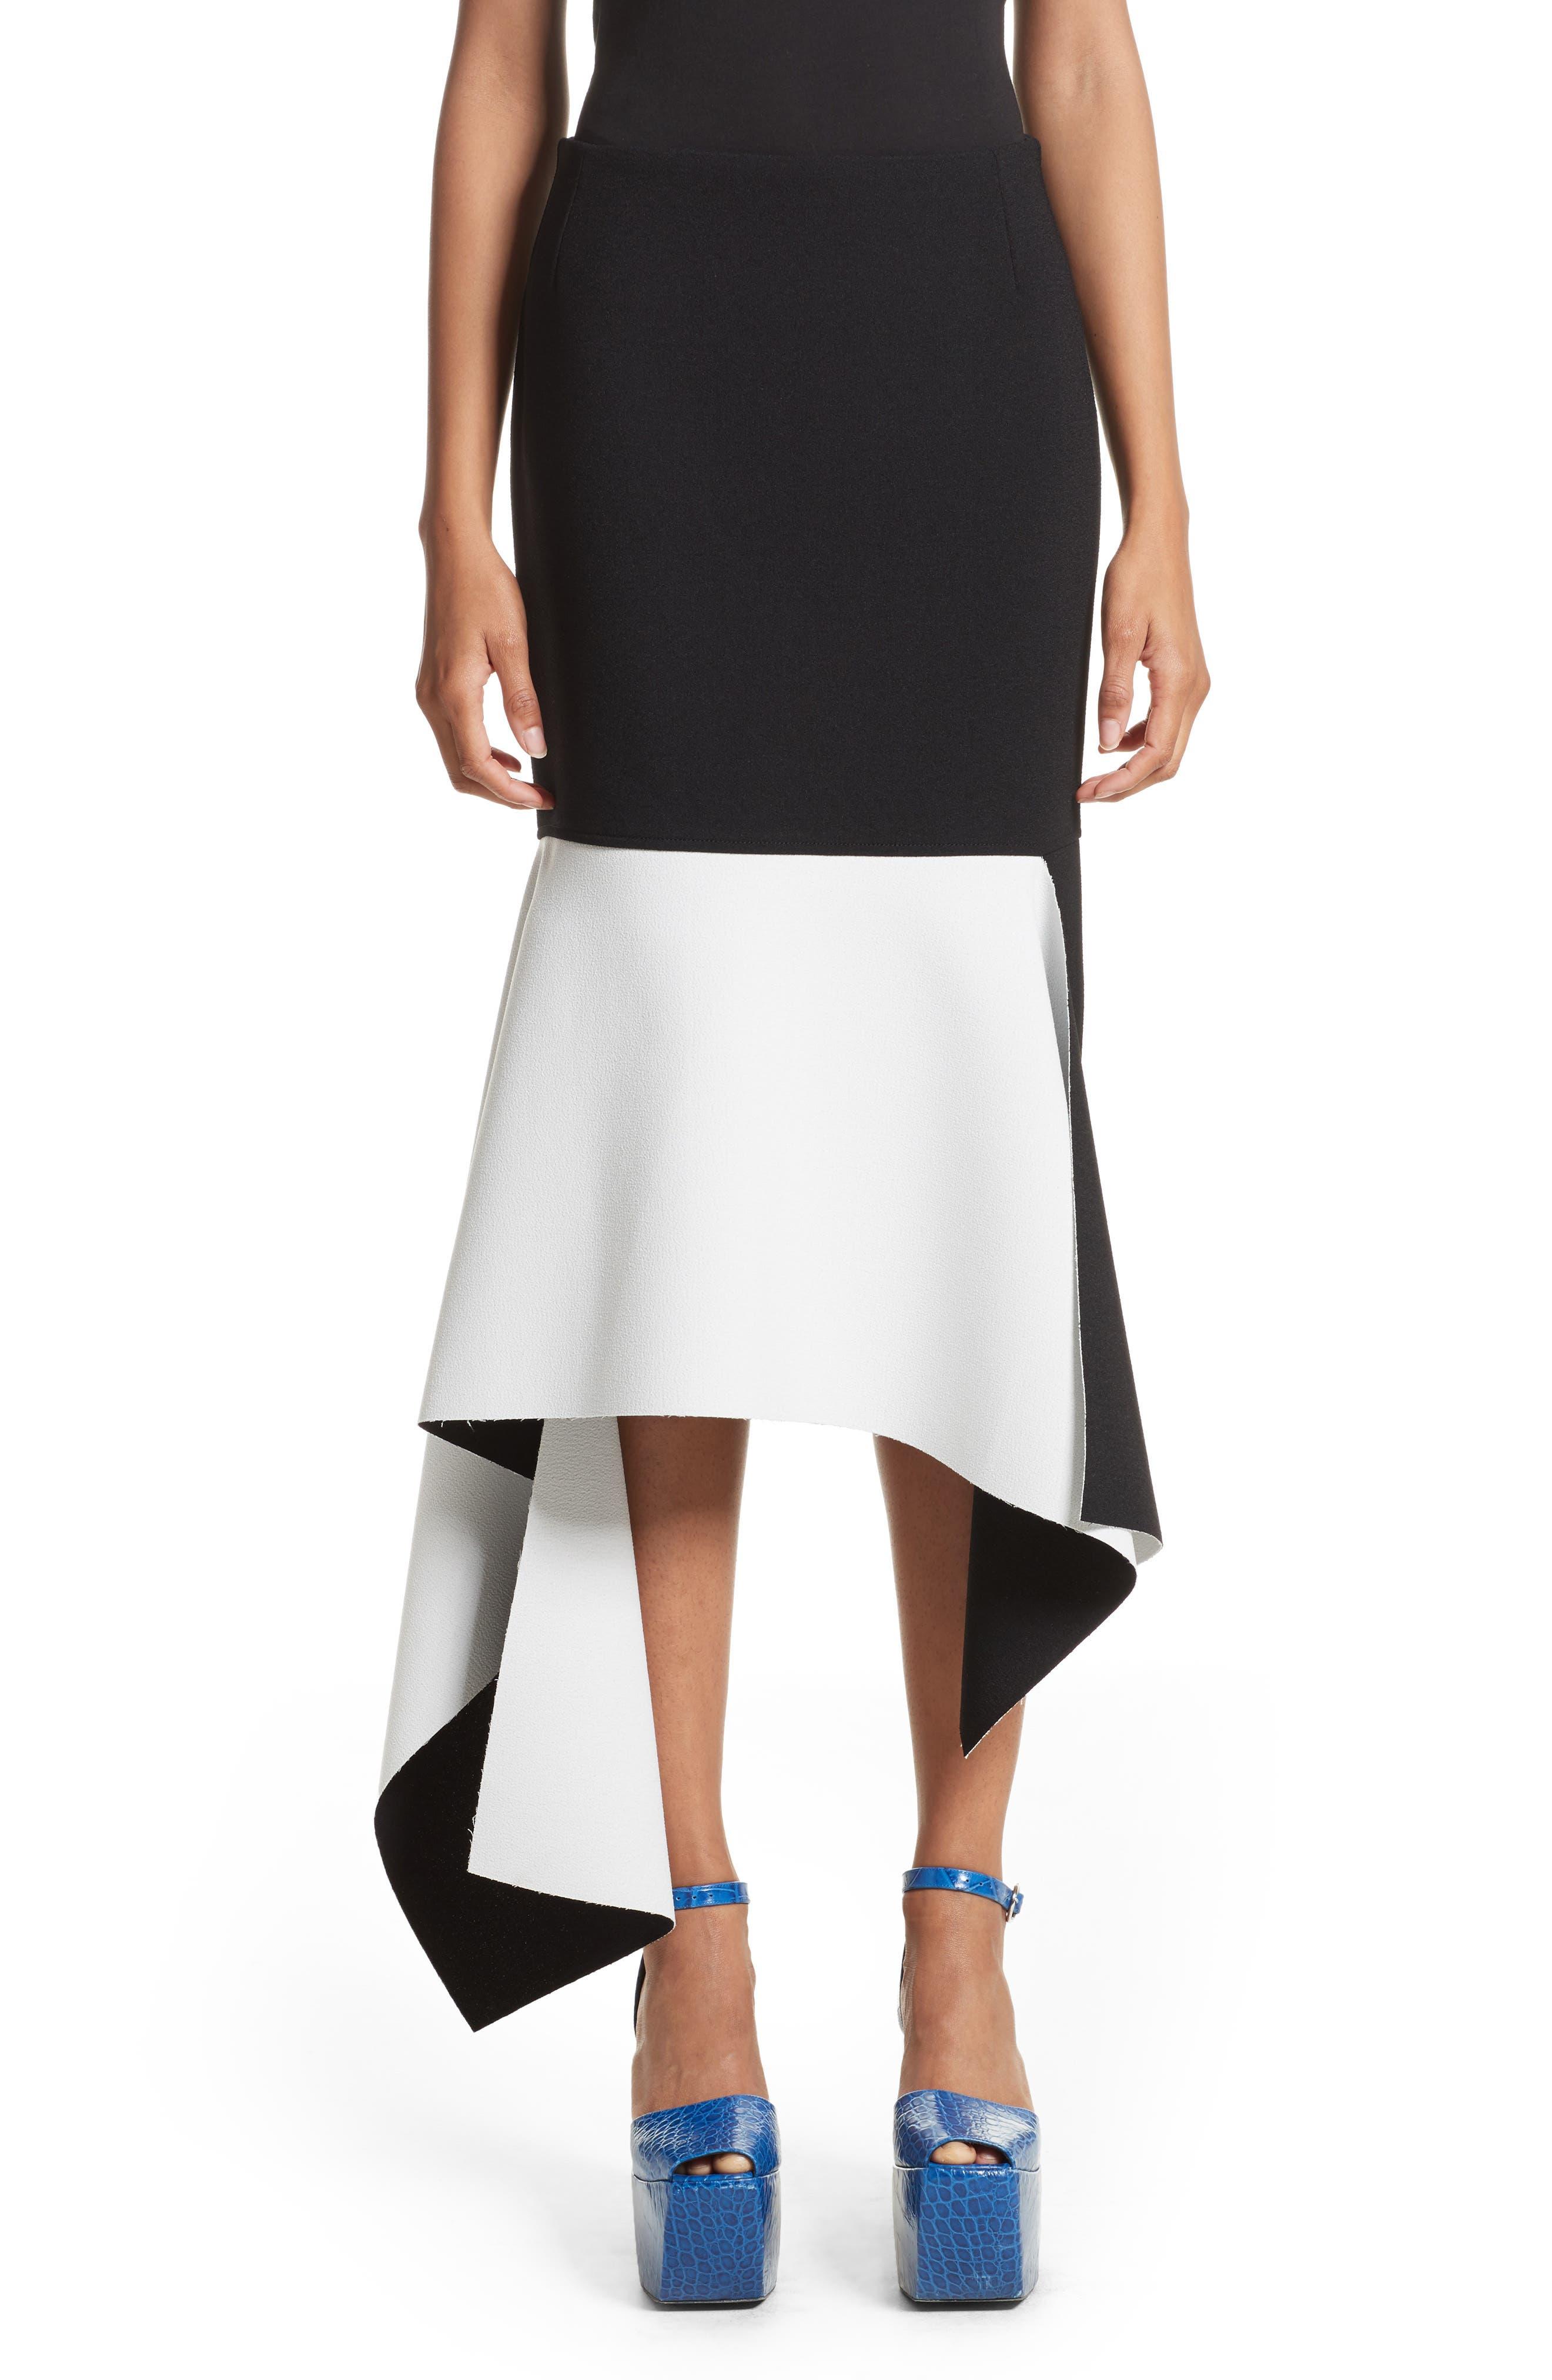 Marques'Almeida Asymmetrical Bicolor Crepe Skirt,                         Main,                         color, Black/White